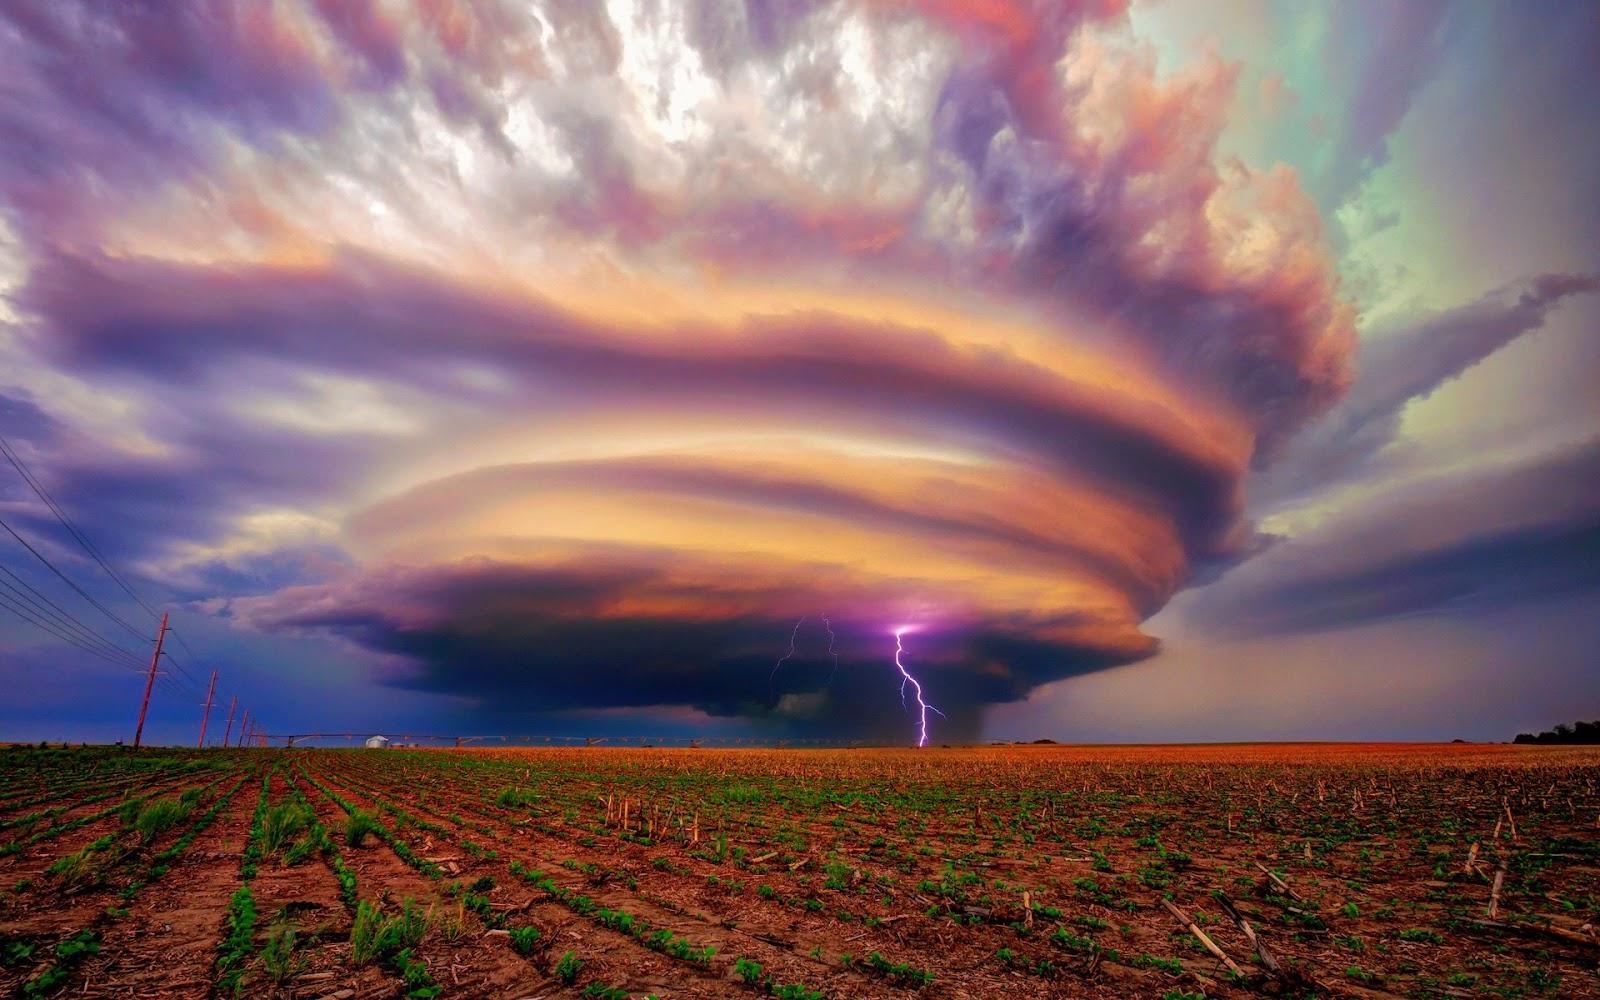 KUMPULAN GAMBAR TORNADO FENOMENA ALAM Foto Angin Topan Tornado